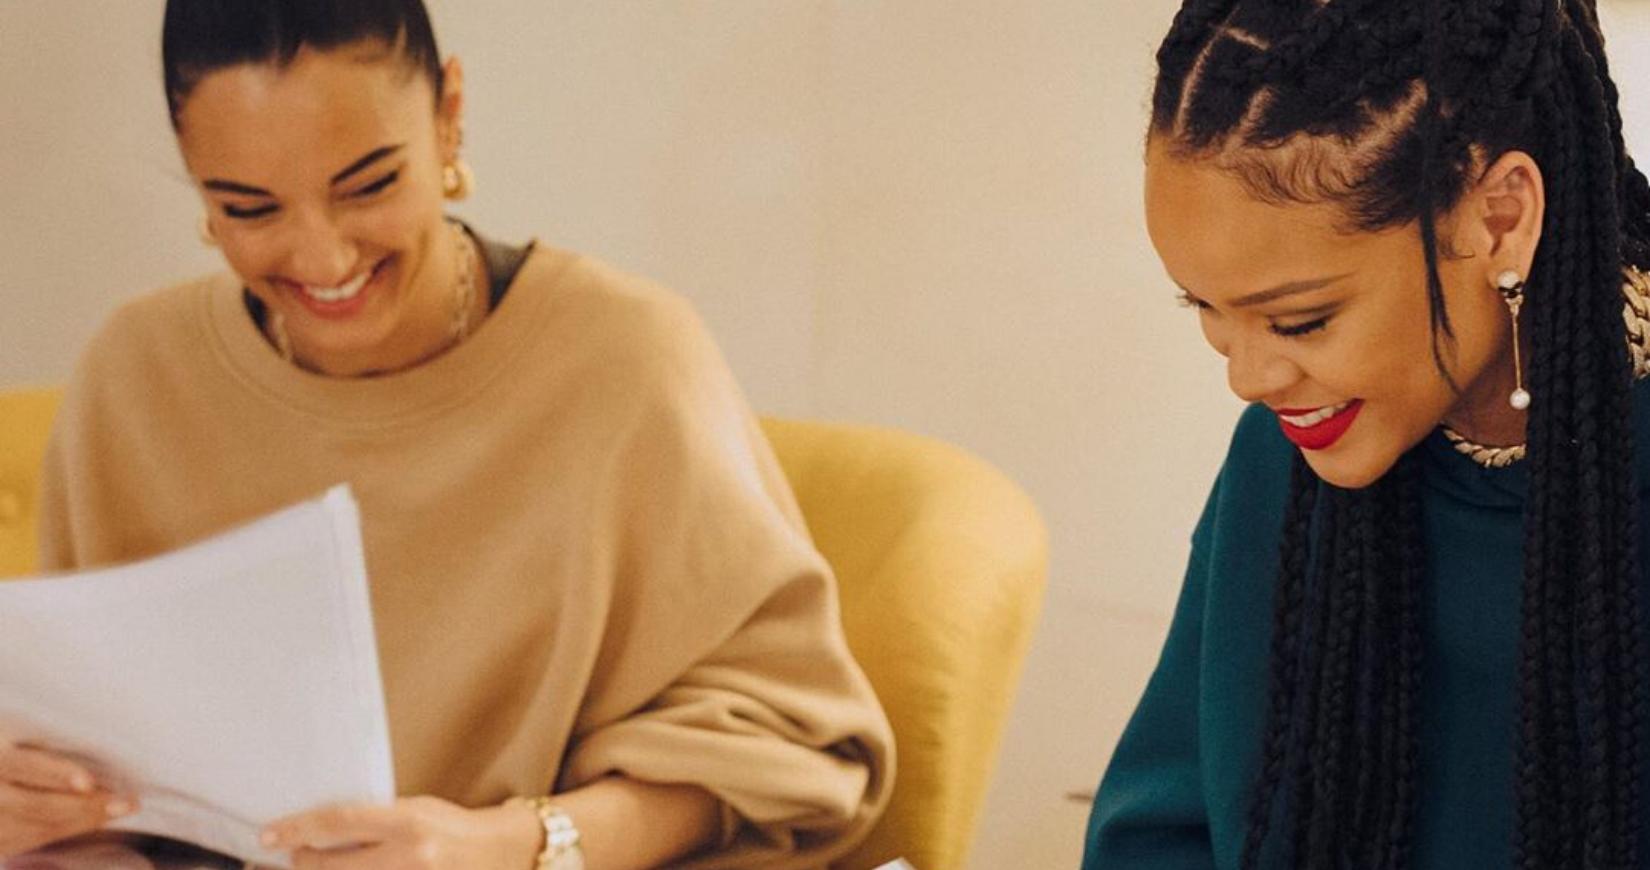 The ultimate shoe collaboration has just dropped: Fenty X Amina Muaddi